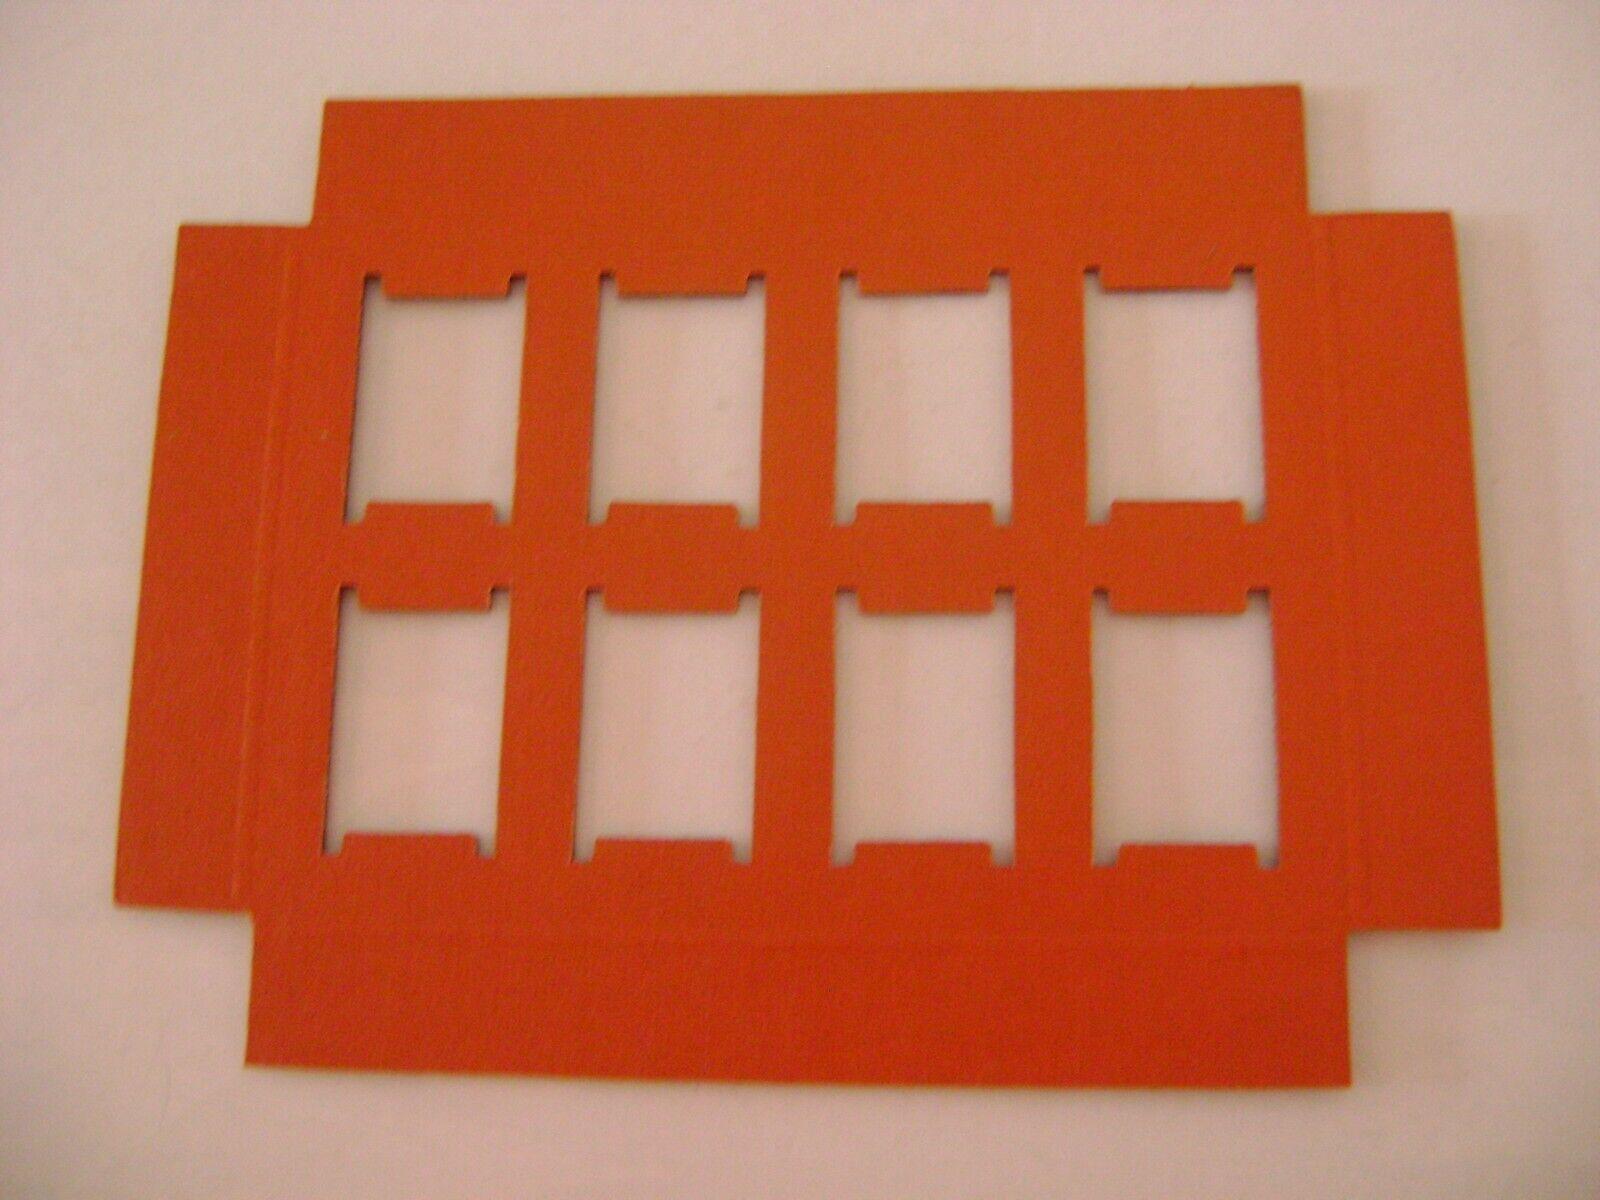 Lionel No. 40 Cable Reel scatola Insert Original arancia